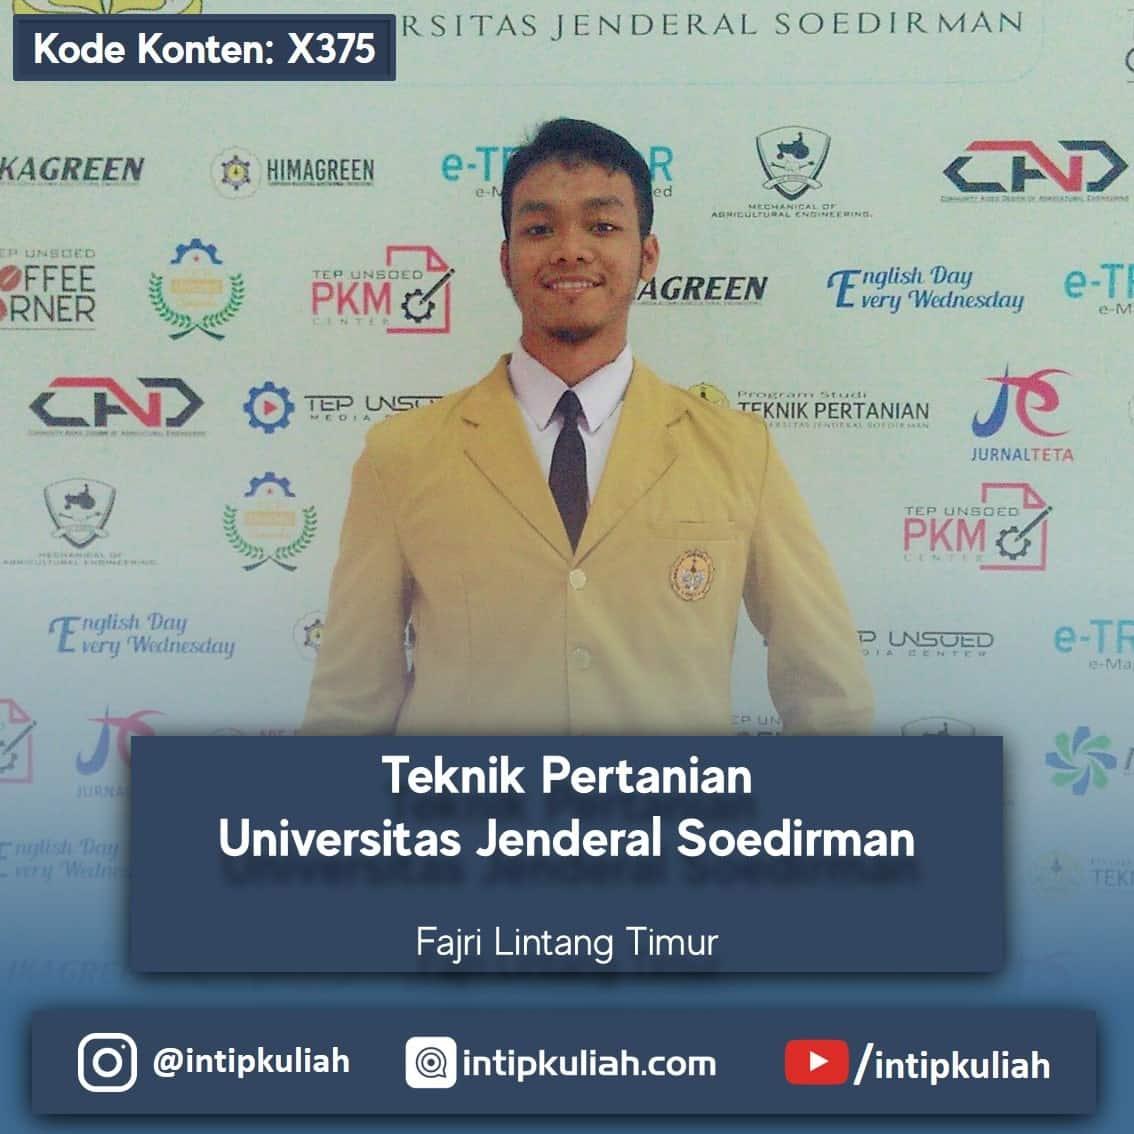 Teknik Pertanian Universitas Jenderal Soedirman (Fajri)